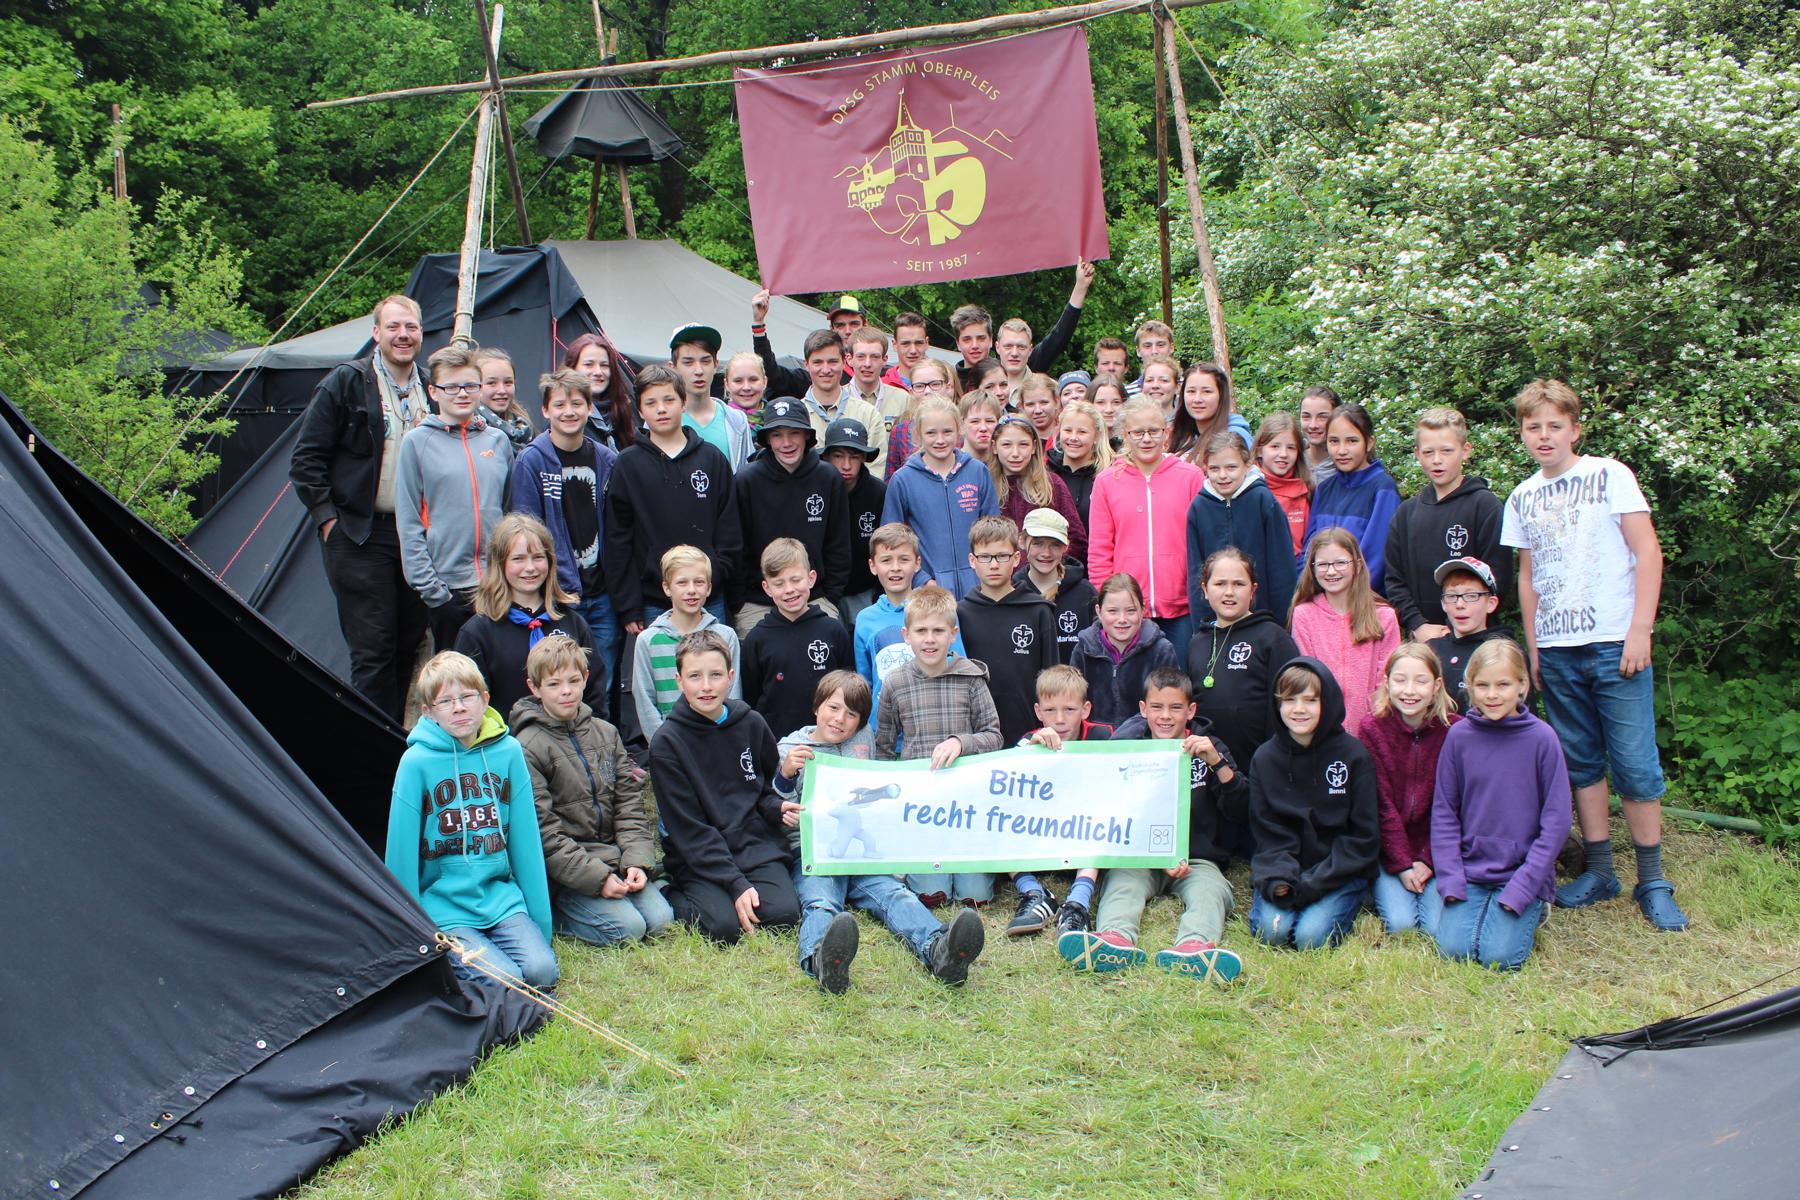 Pfingstlager in Westernohe 2015